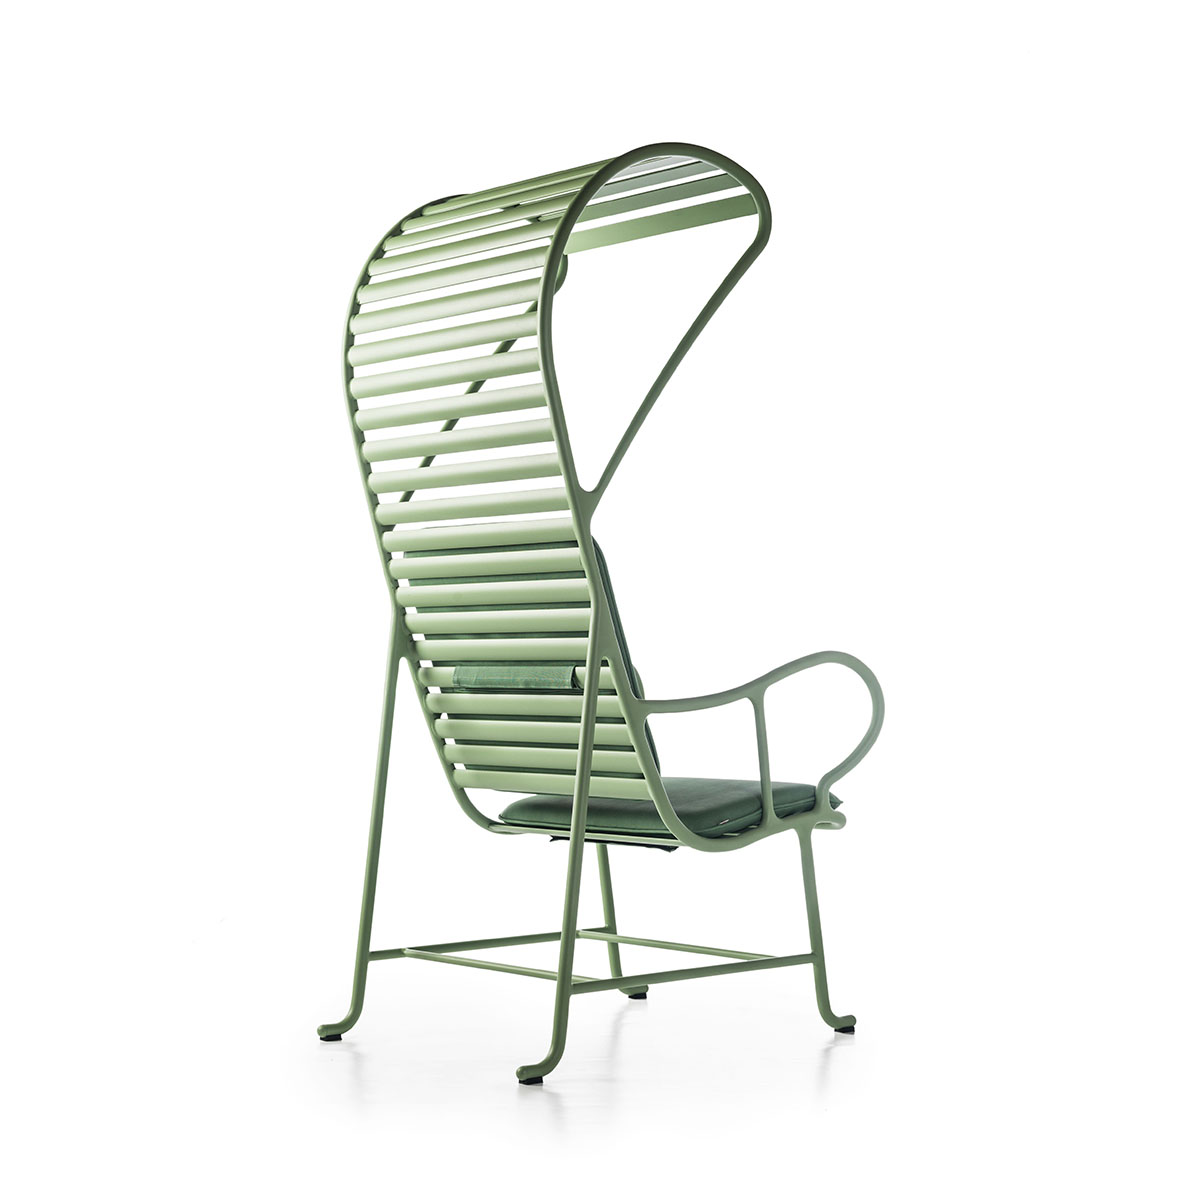 b.d barcelona design  Gardenias With Pergola - Outdoor 户外扶手椅